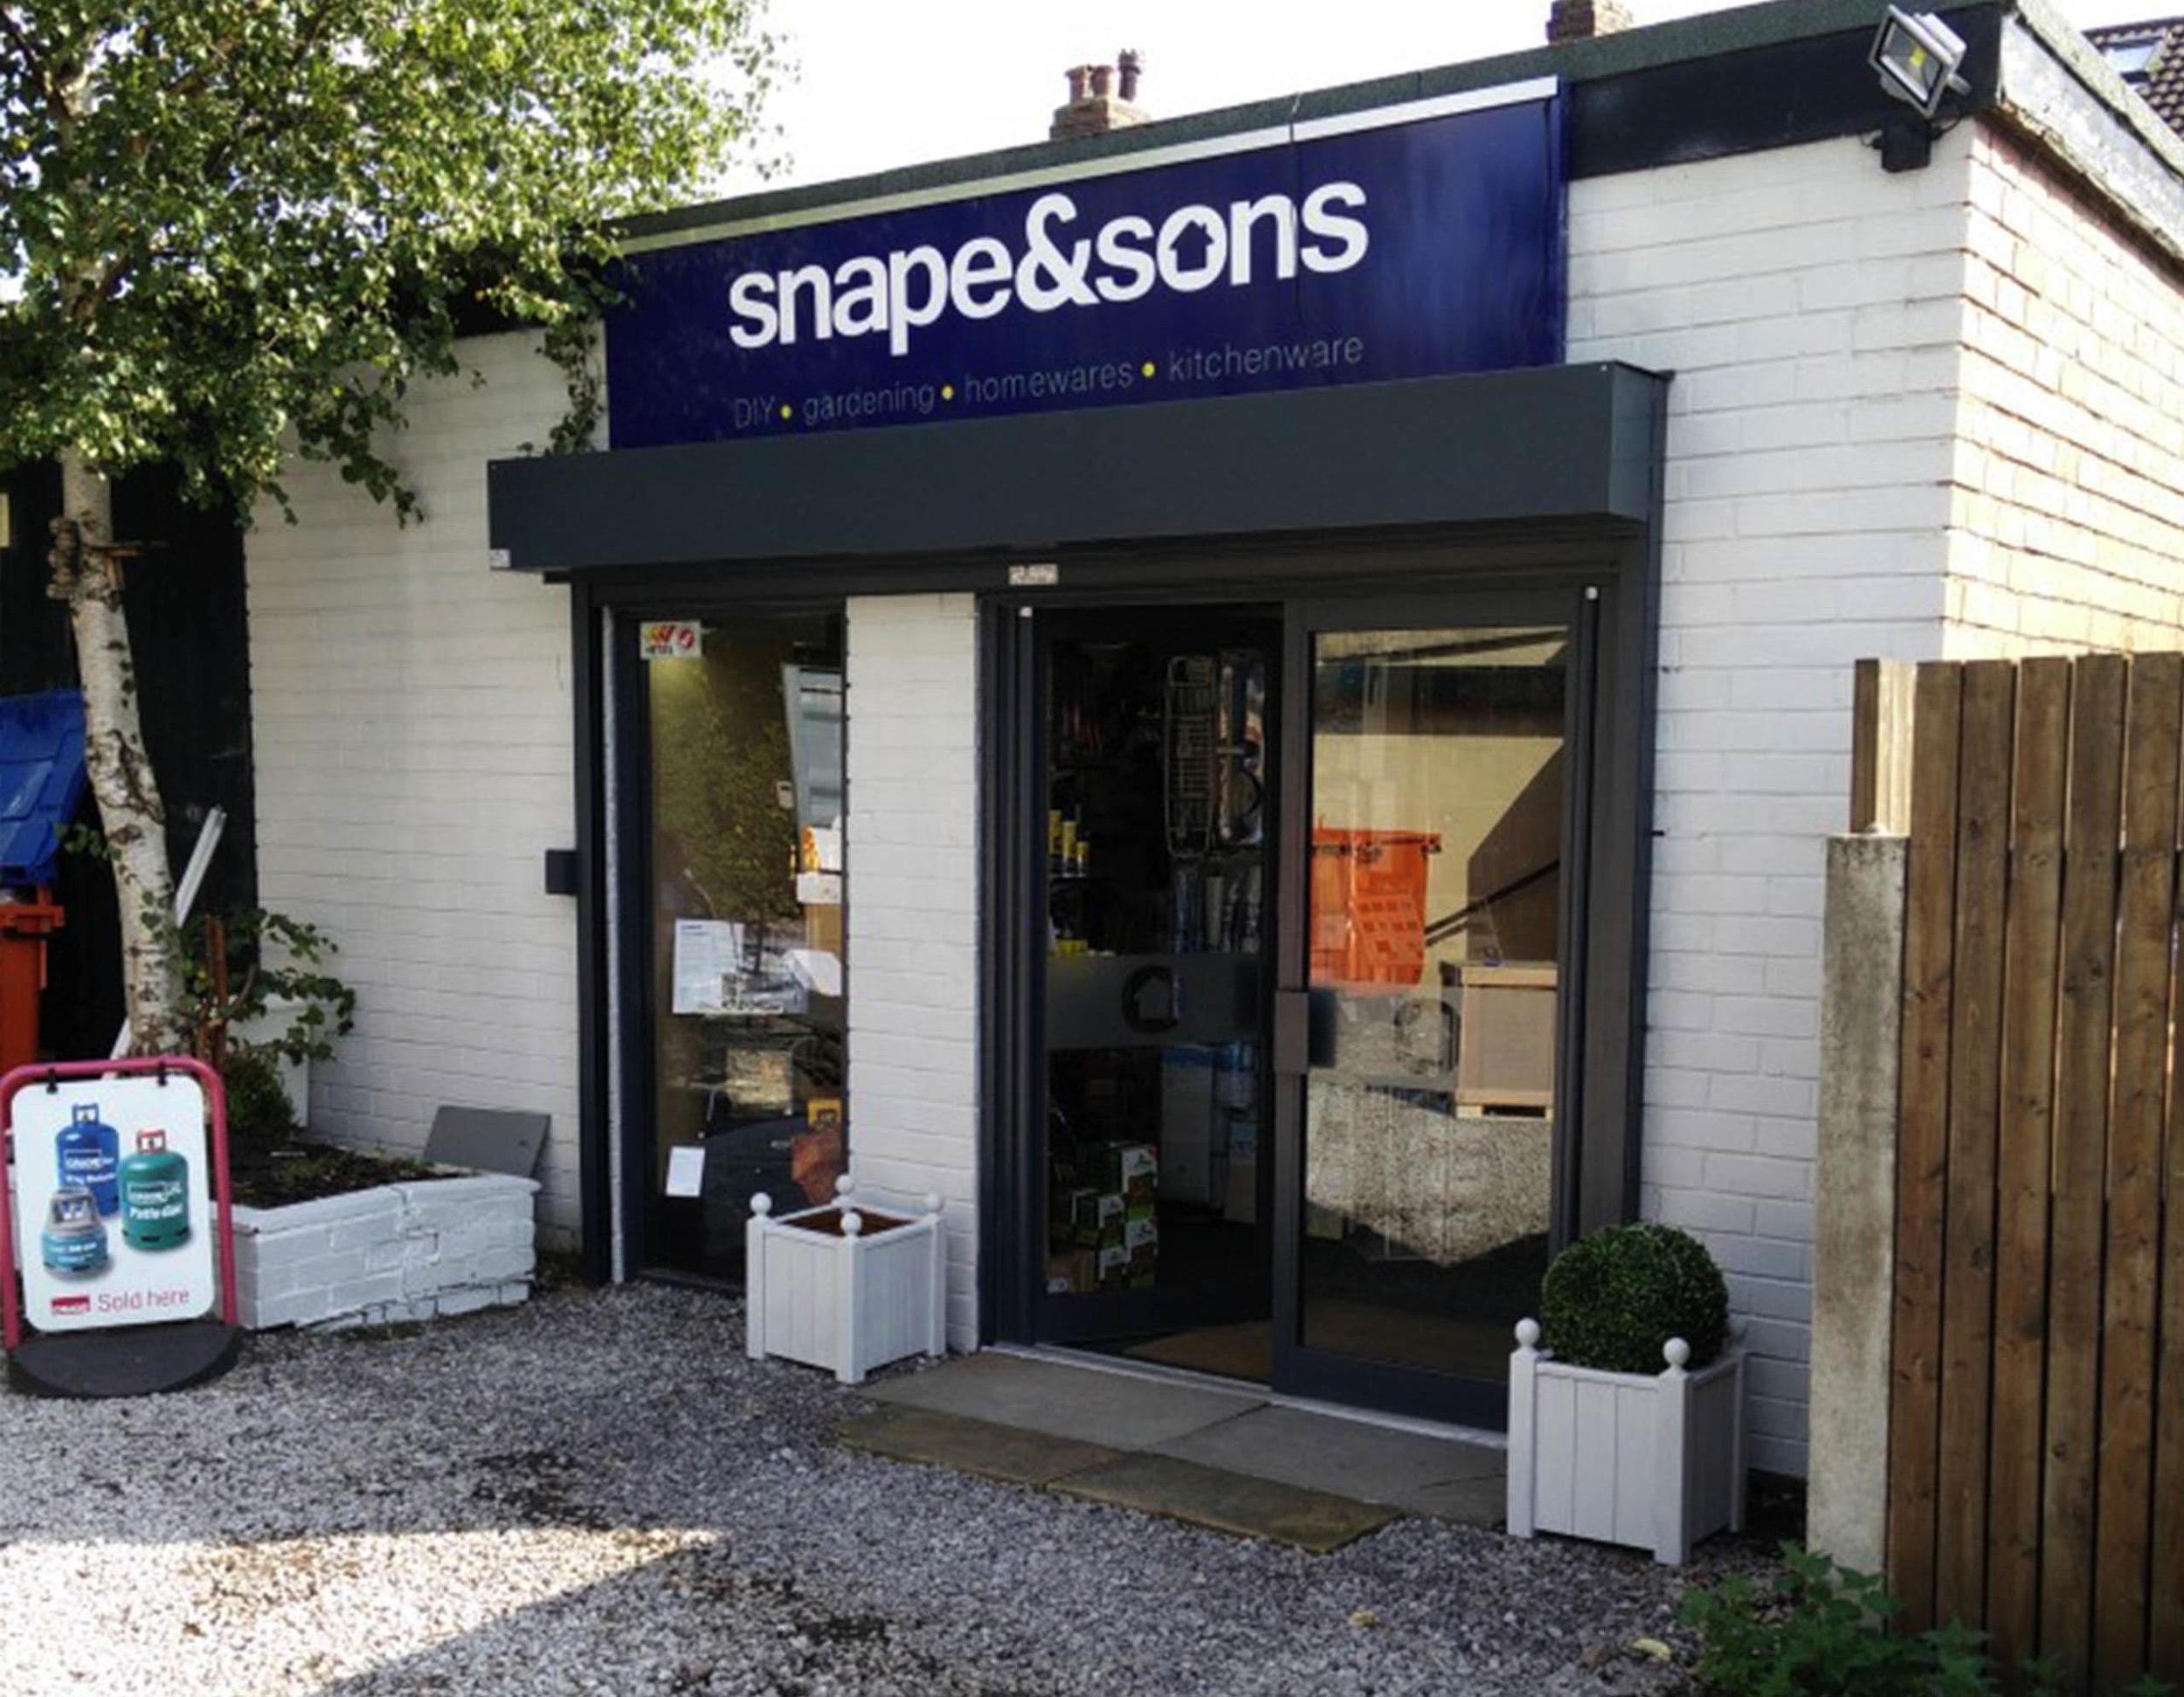 snape-and-sons-rear-door.jpg